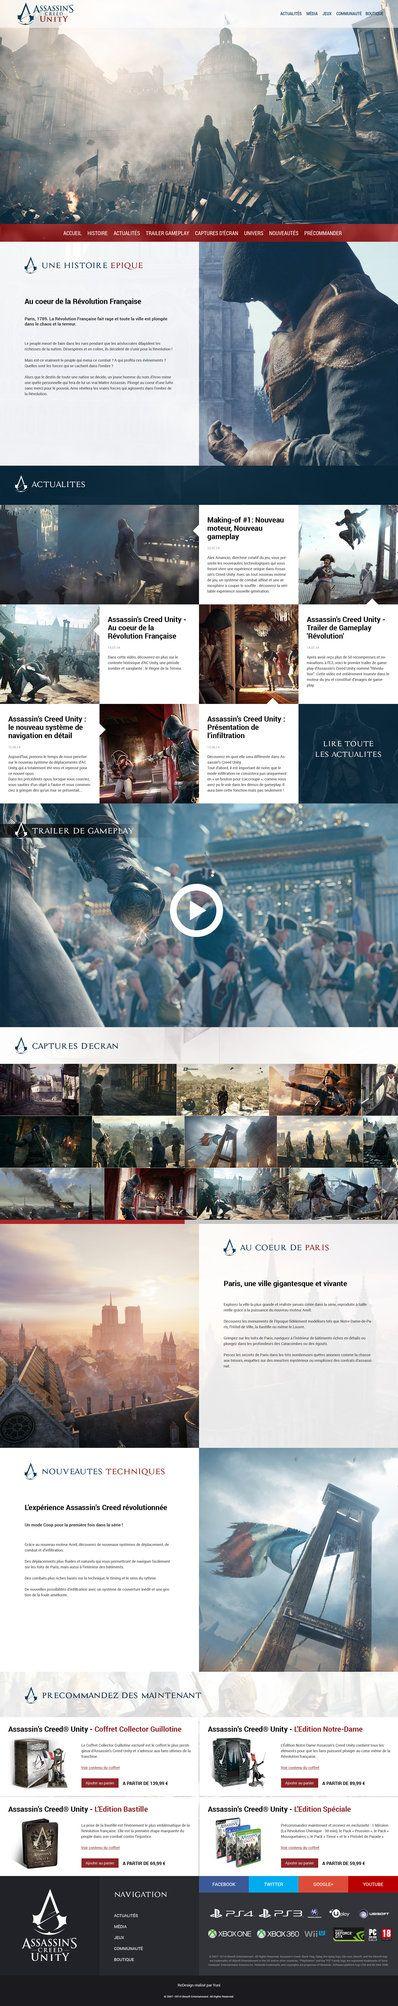 http://yuni-style.deviantart.com/art/Assassin-s-Creed-Unity-Website-ReDesign-471069544 #webdesign #website #layout #inspiration #game #web